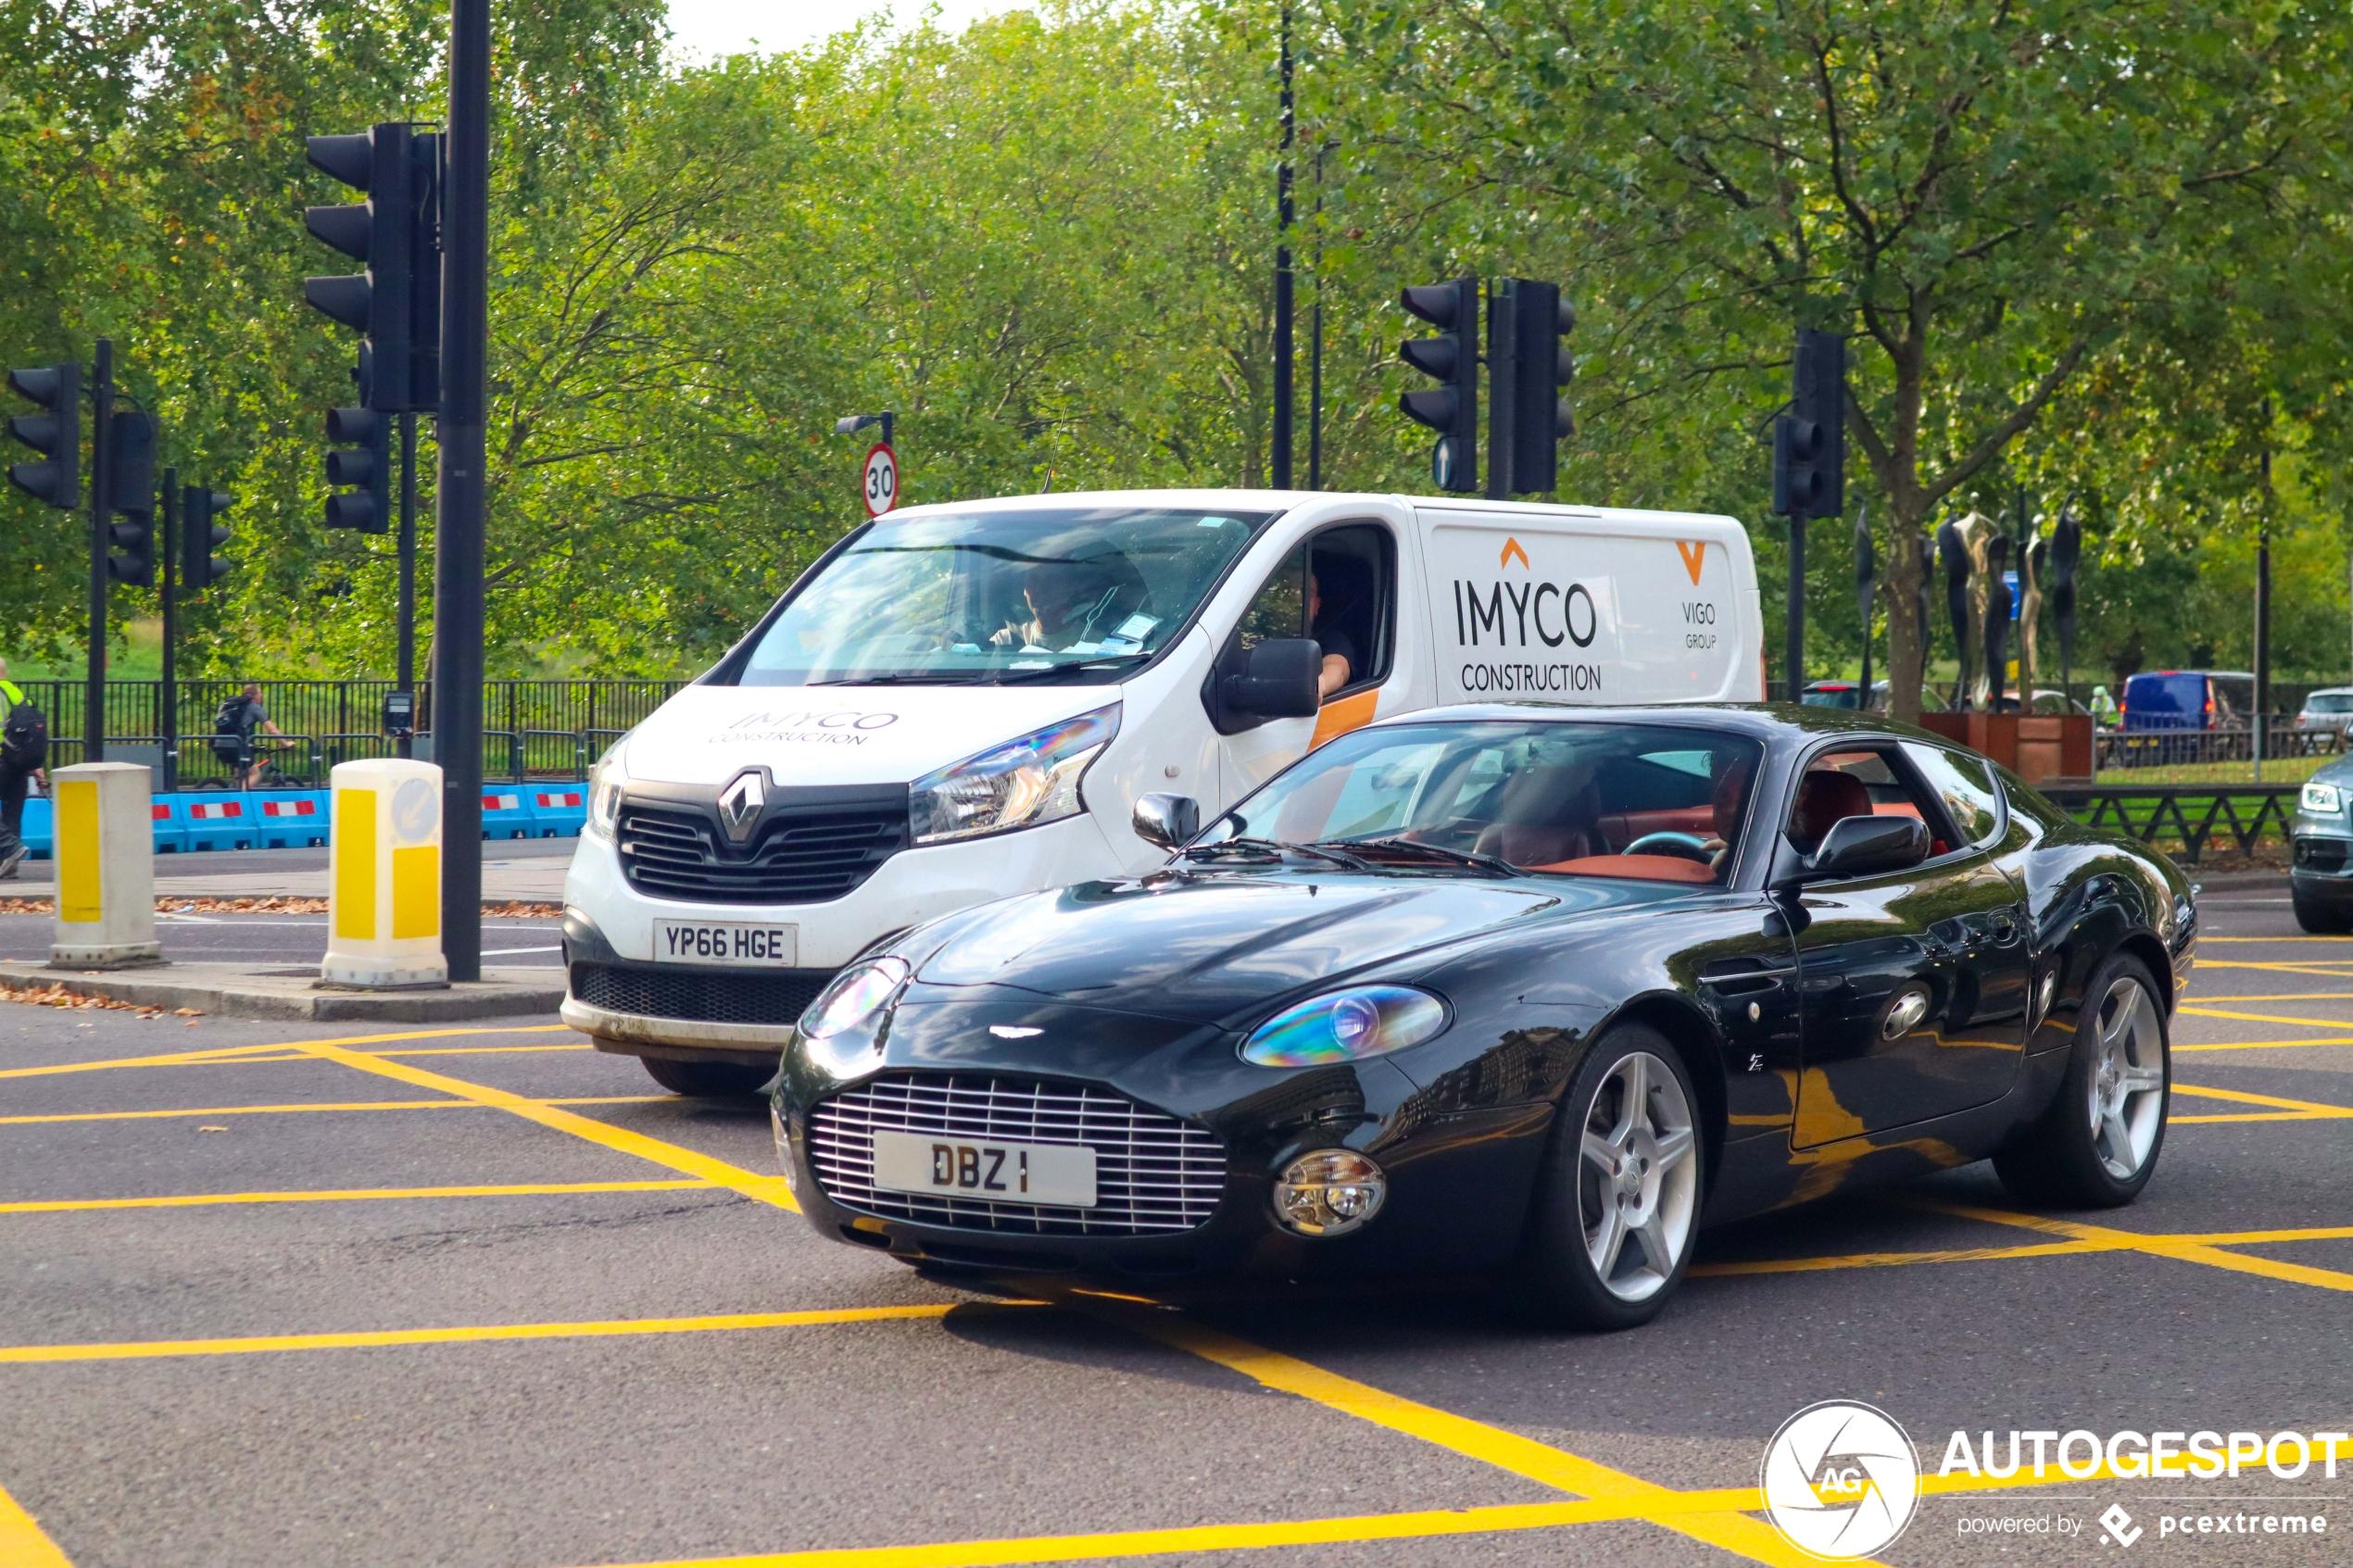 Aston Martin DB7 Zagato mengt zich in Londens stadsverkeer